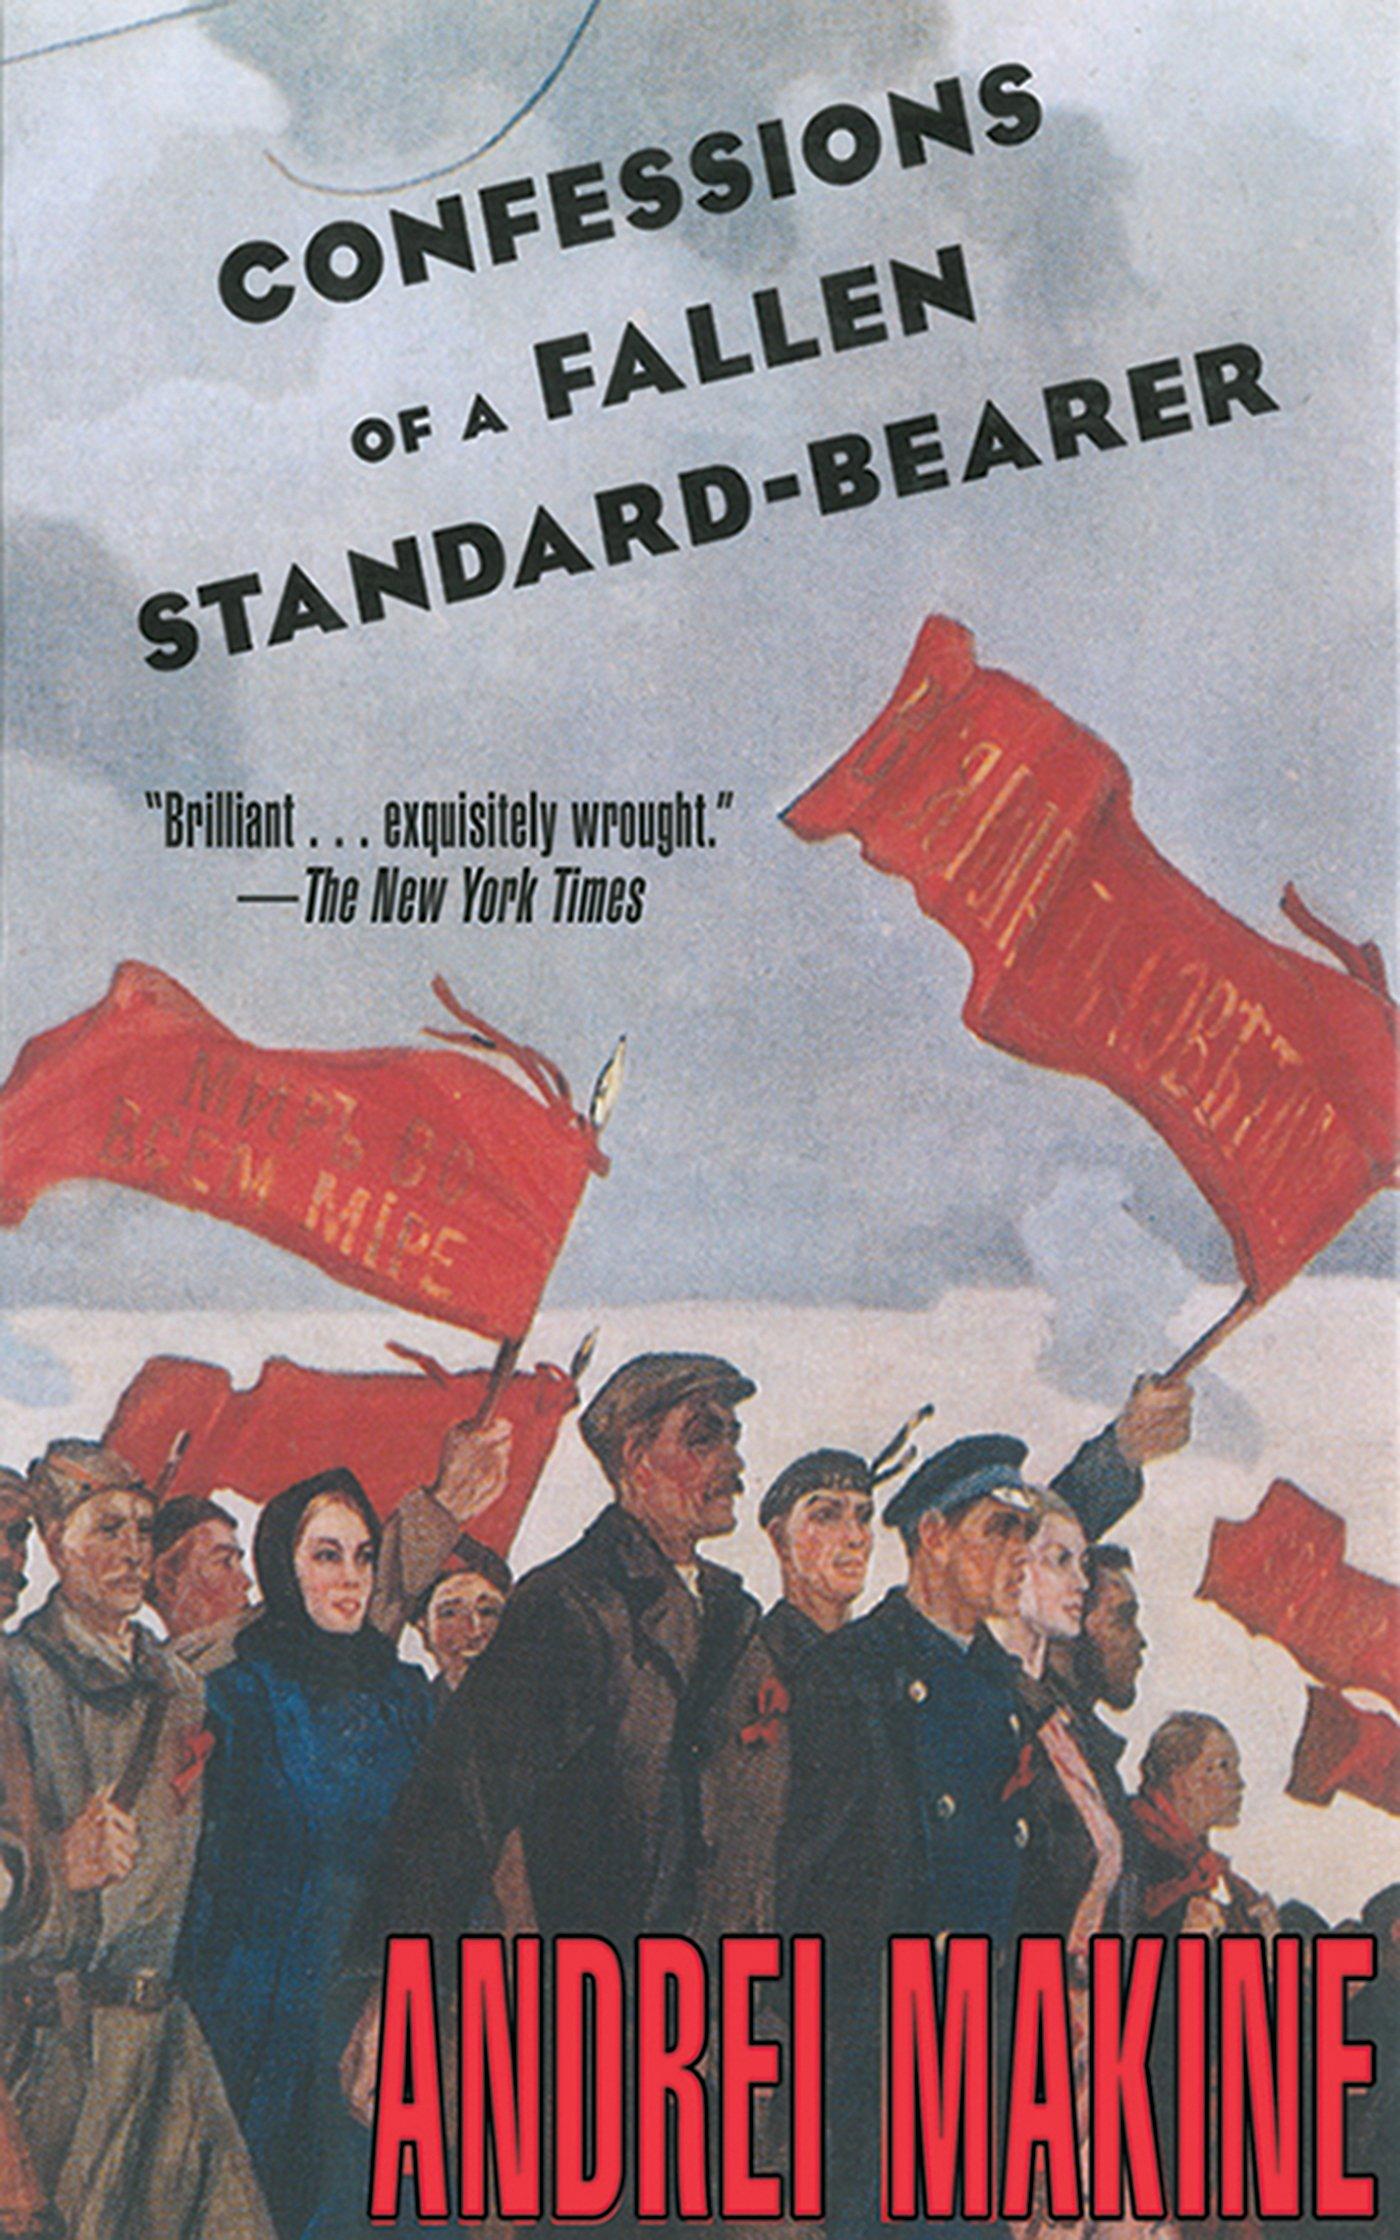 Download Confessions of a Fallen Standard-Bearer: A Novel ebook